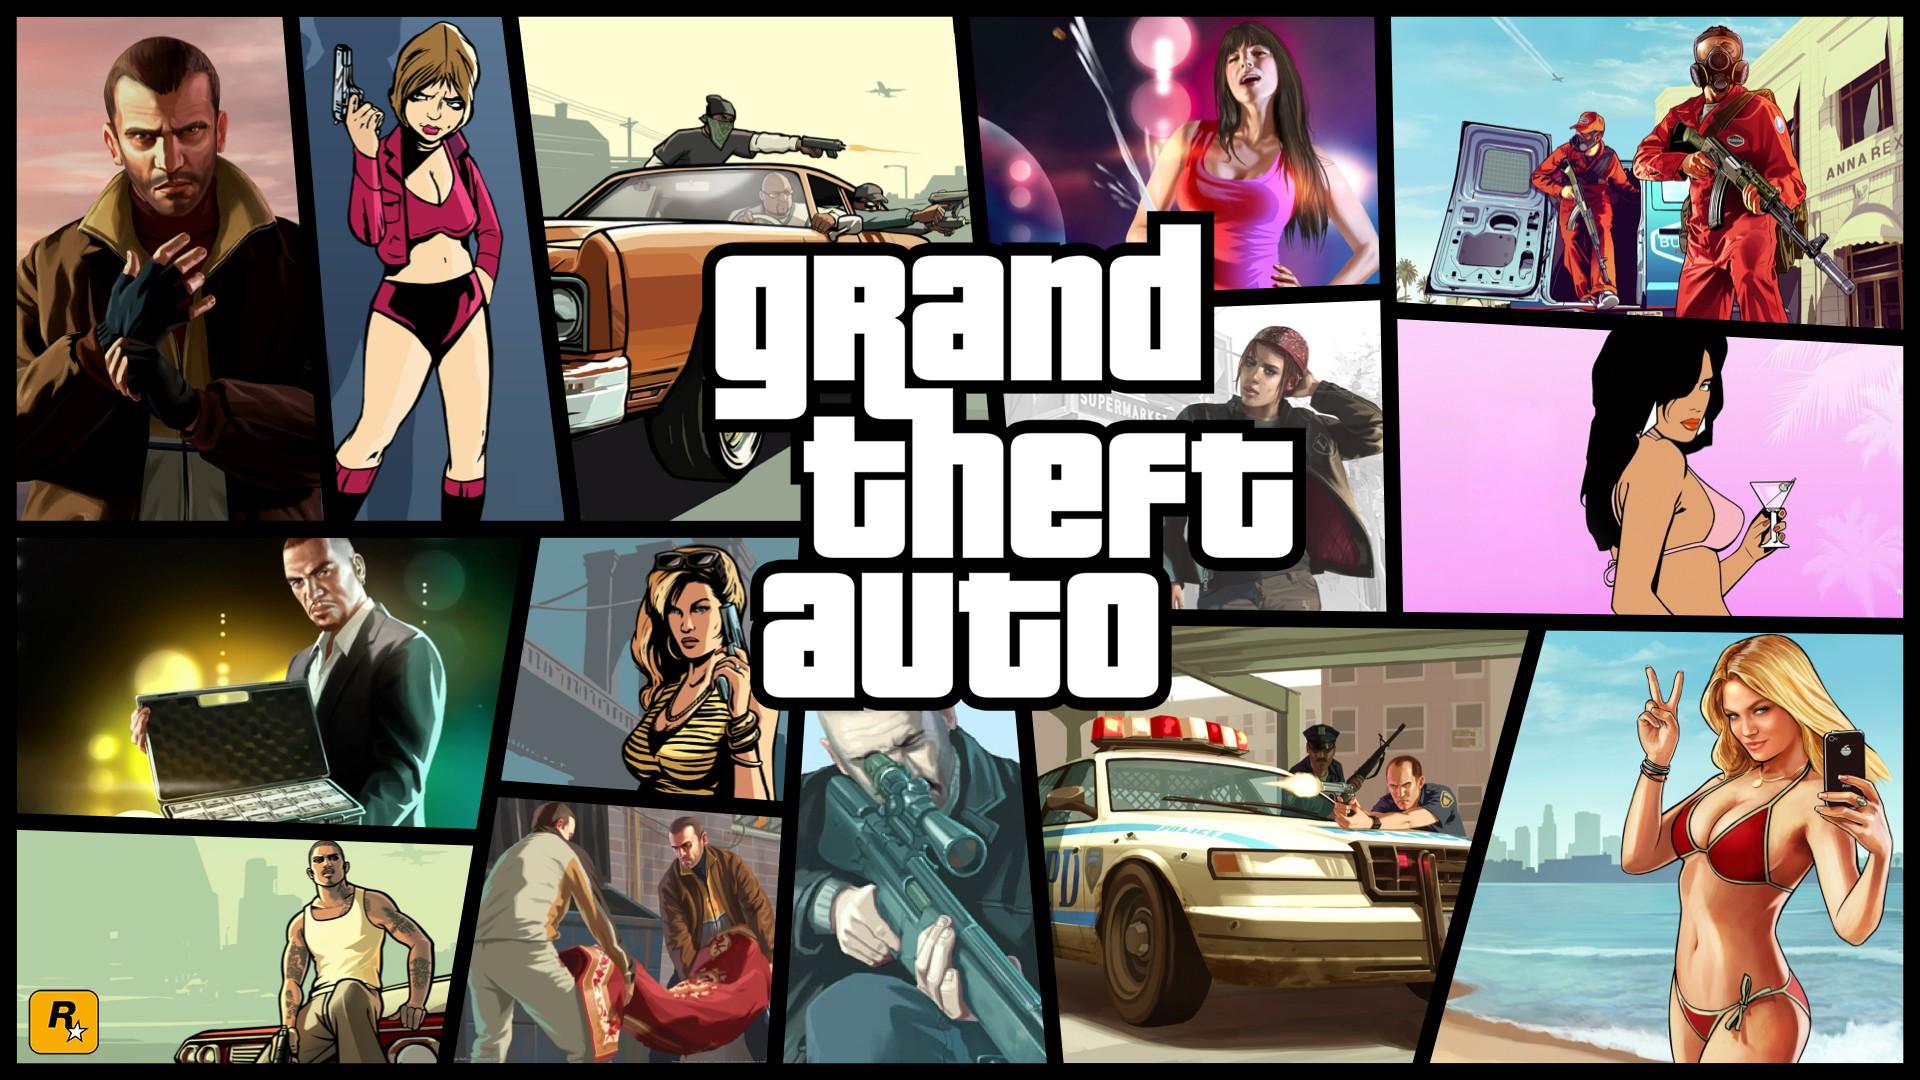 Grand Theft Auto Series wallpaper   ForWallpapercom 1920x1080